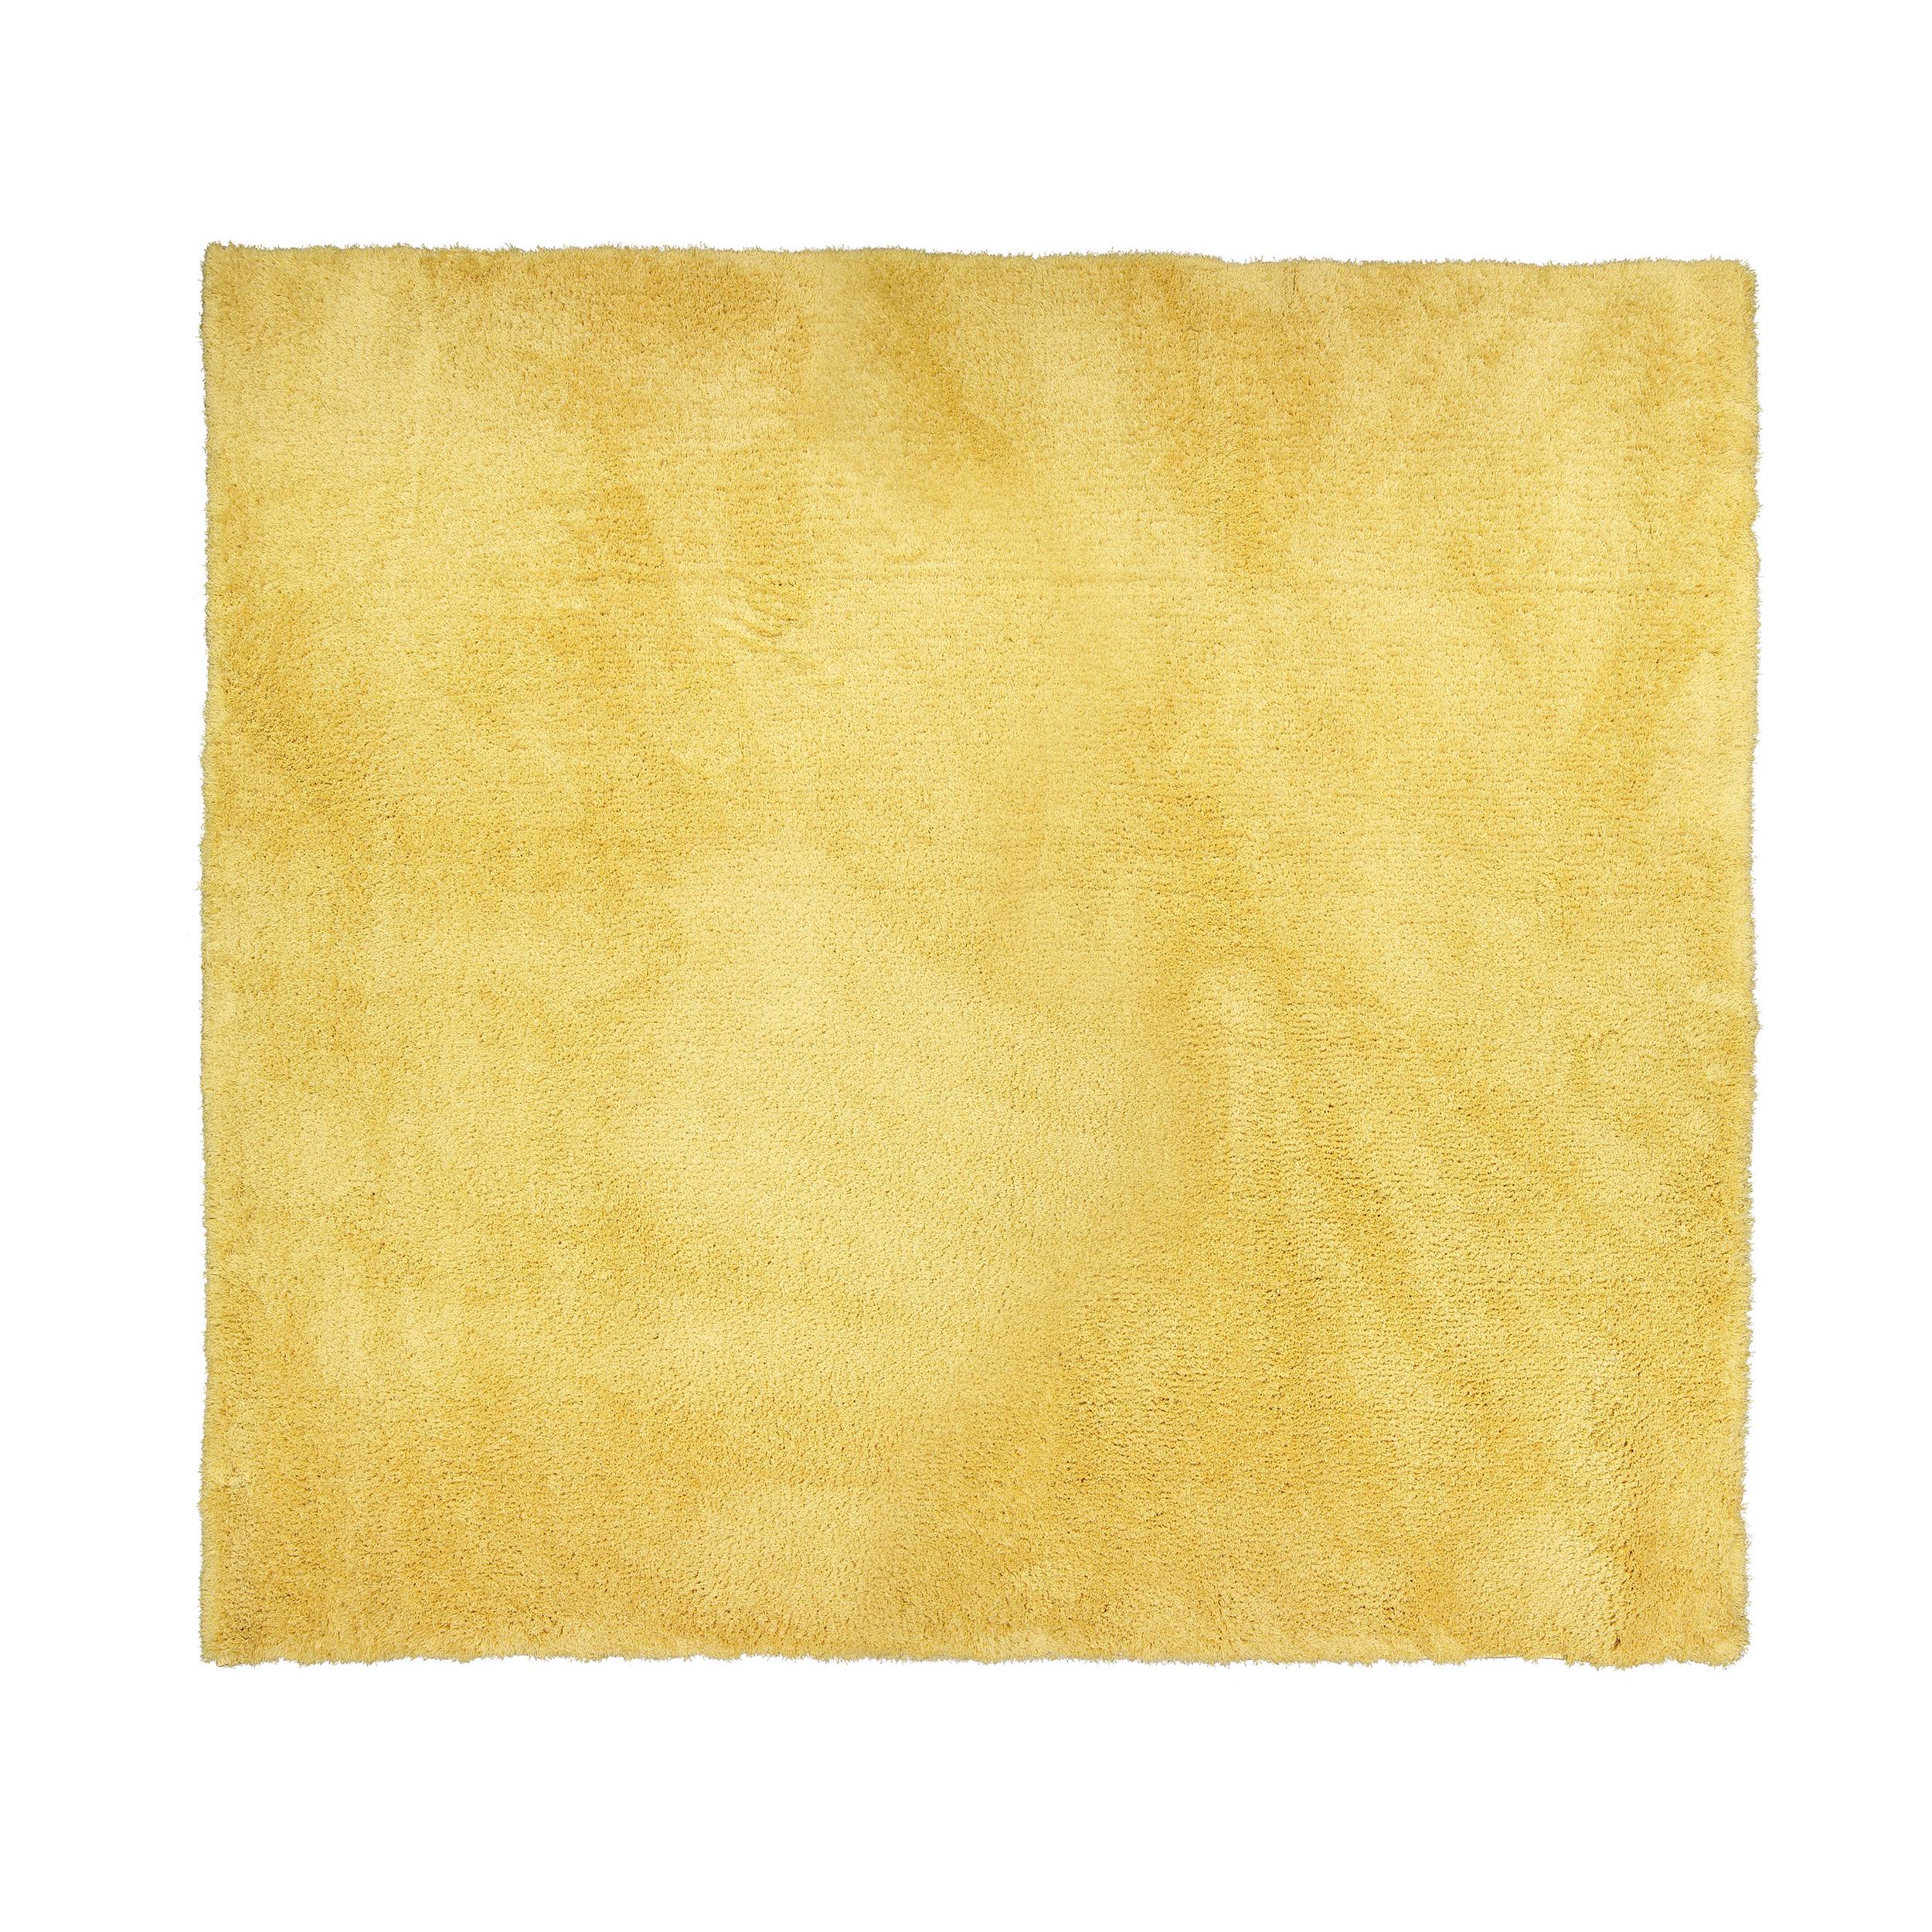 فرش ماشینی طرح شگی کد SH02 زمینه طلایی